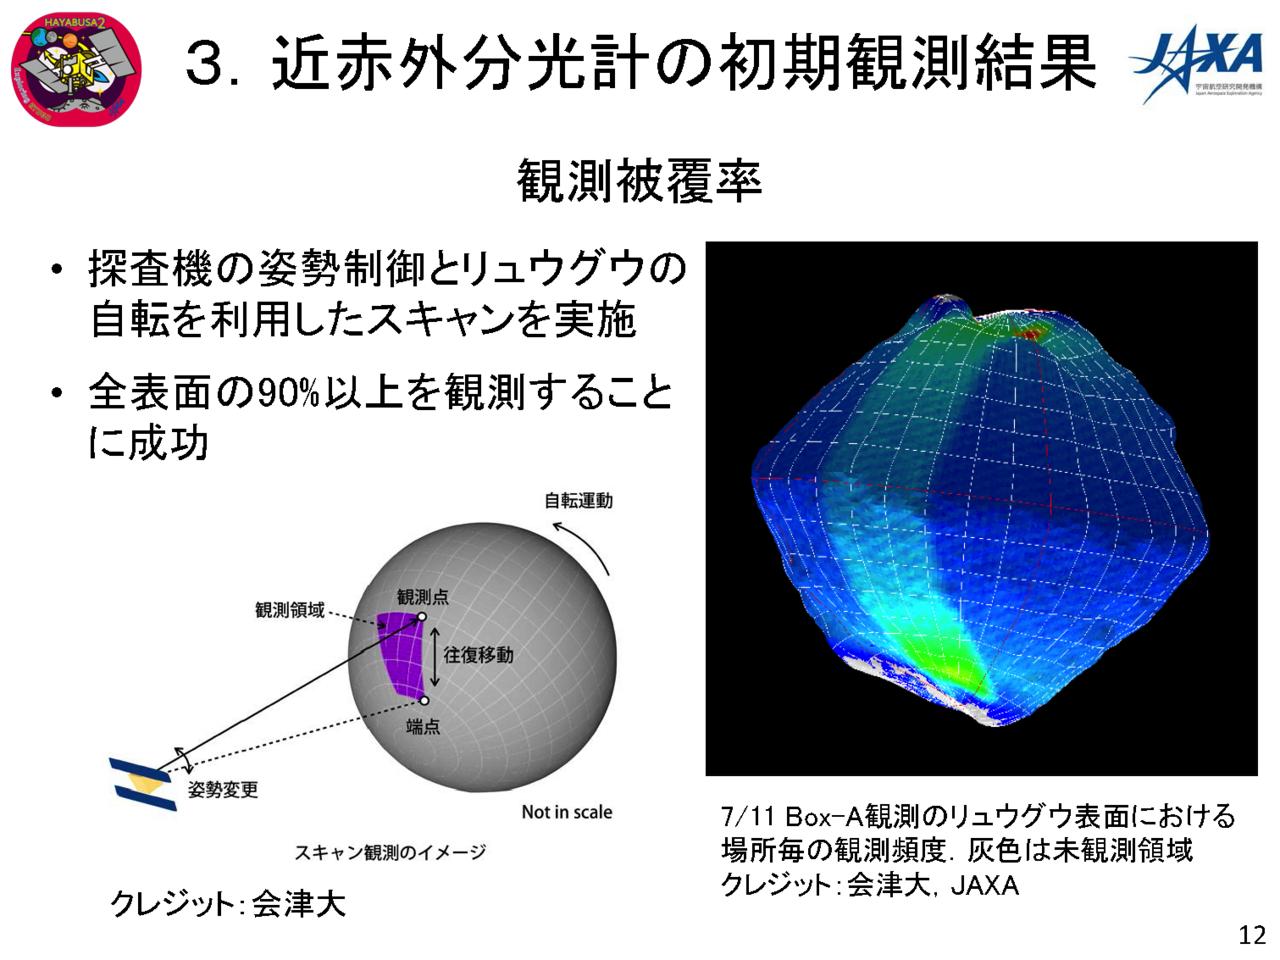 f:id:Imamura:20180802145932p:plain